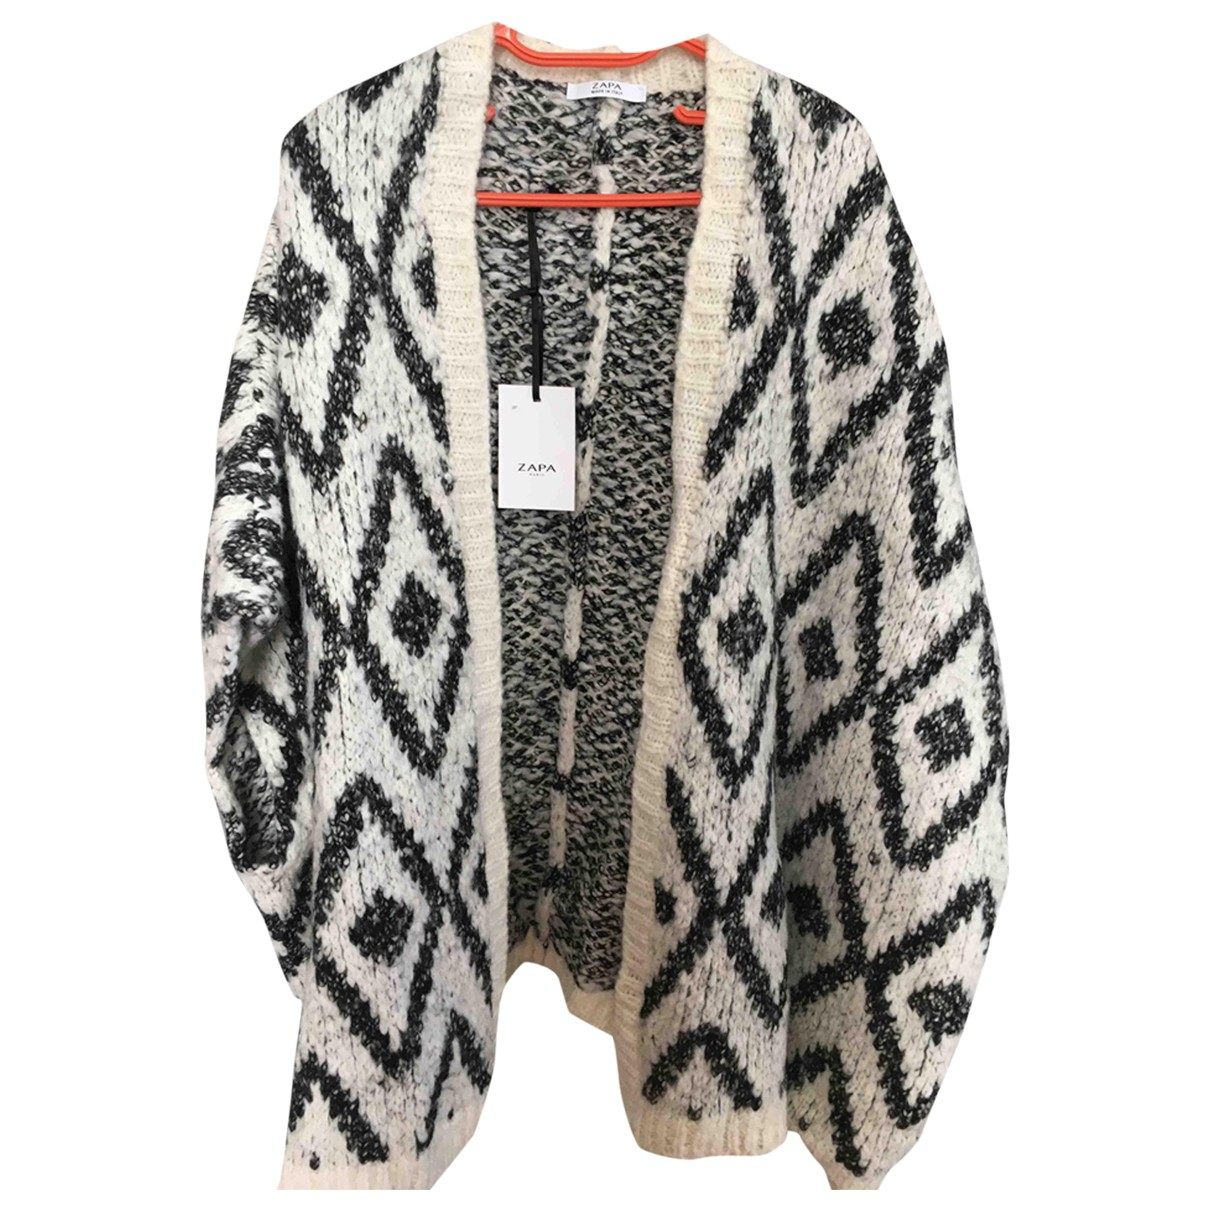 Zapa - Pull   pour femme en laine - ecru